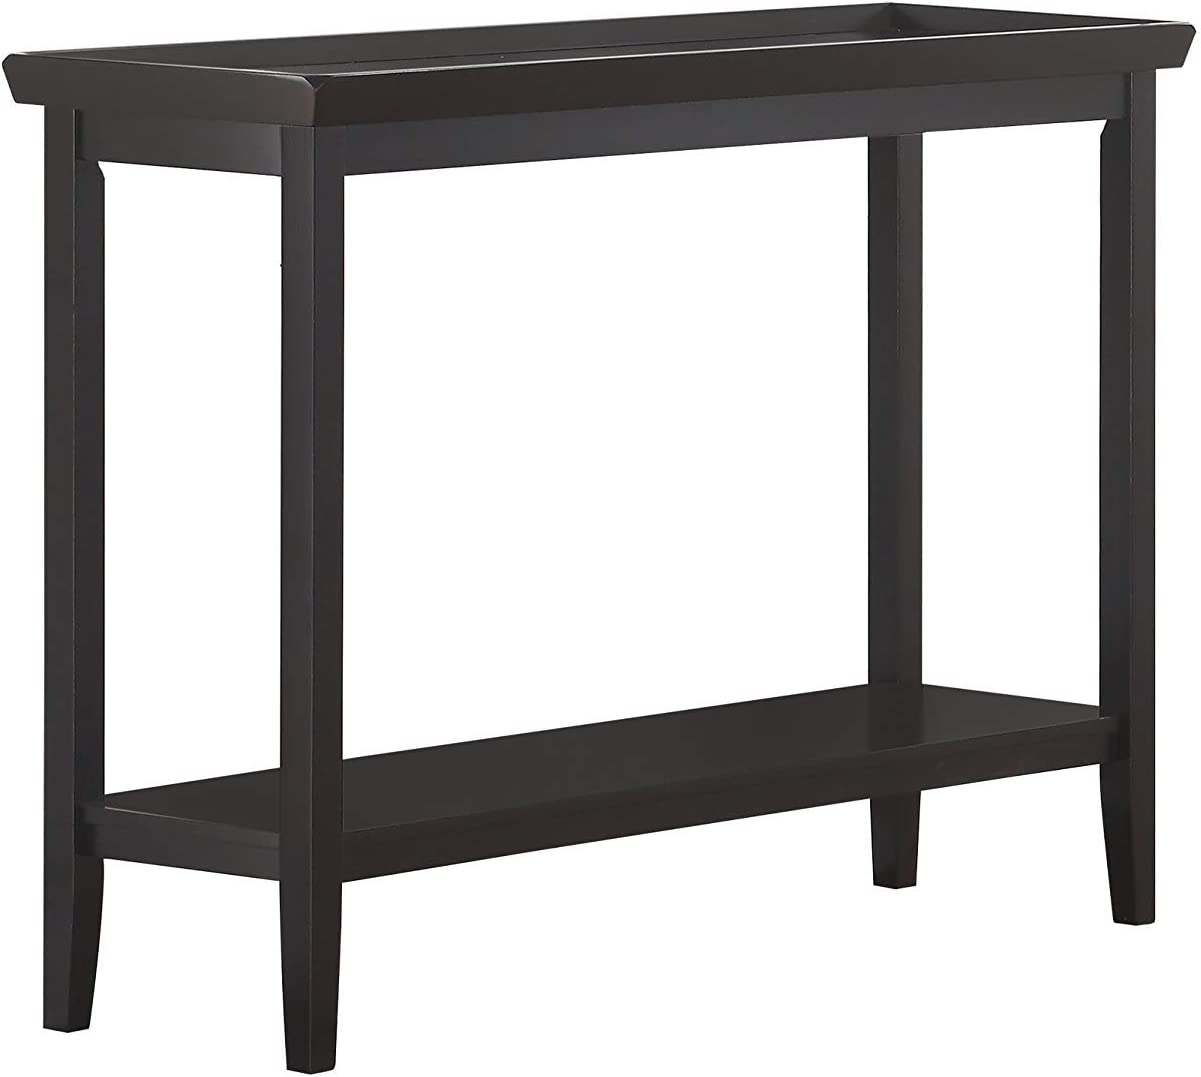 Convenience Concepts Ledgewood Console Table, Black